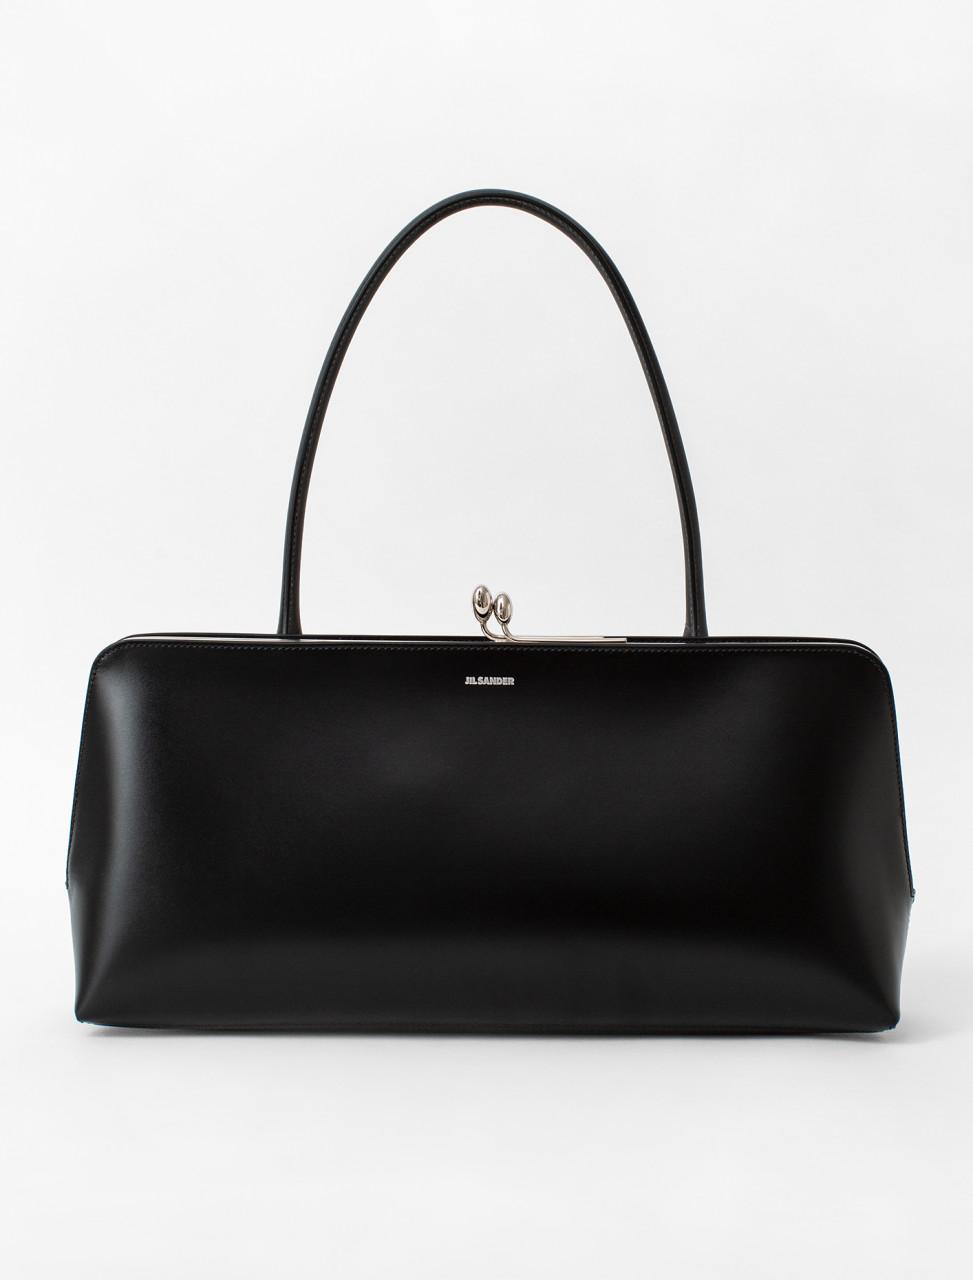 Calfskin Frame Bag in Black